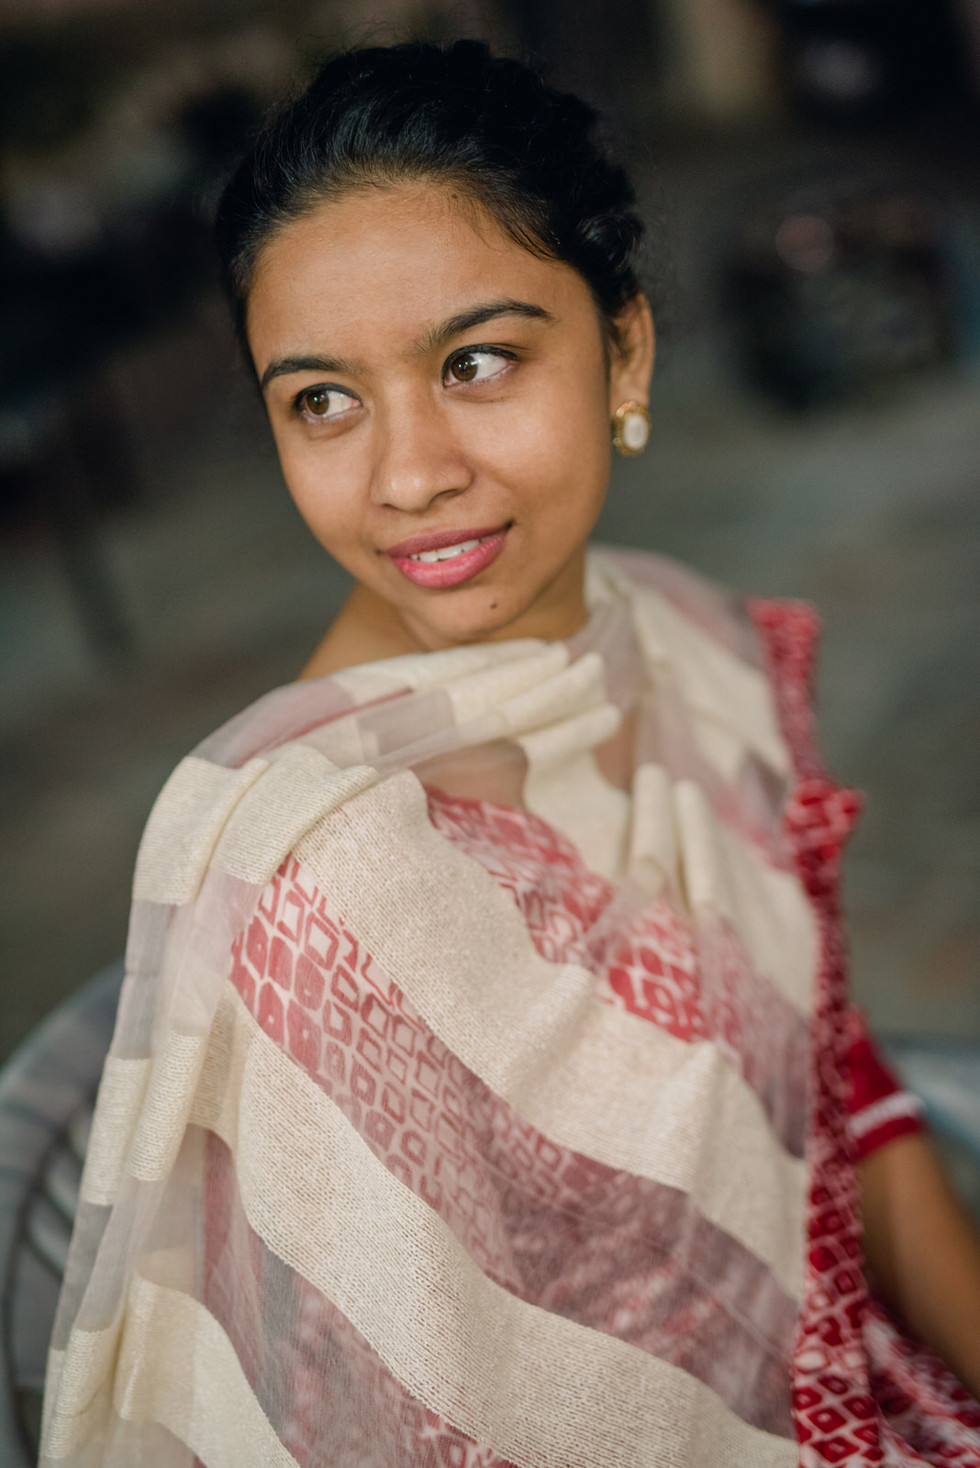 Asian Female Portrait Punjab.jpg